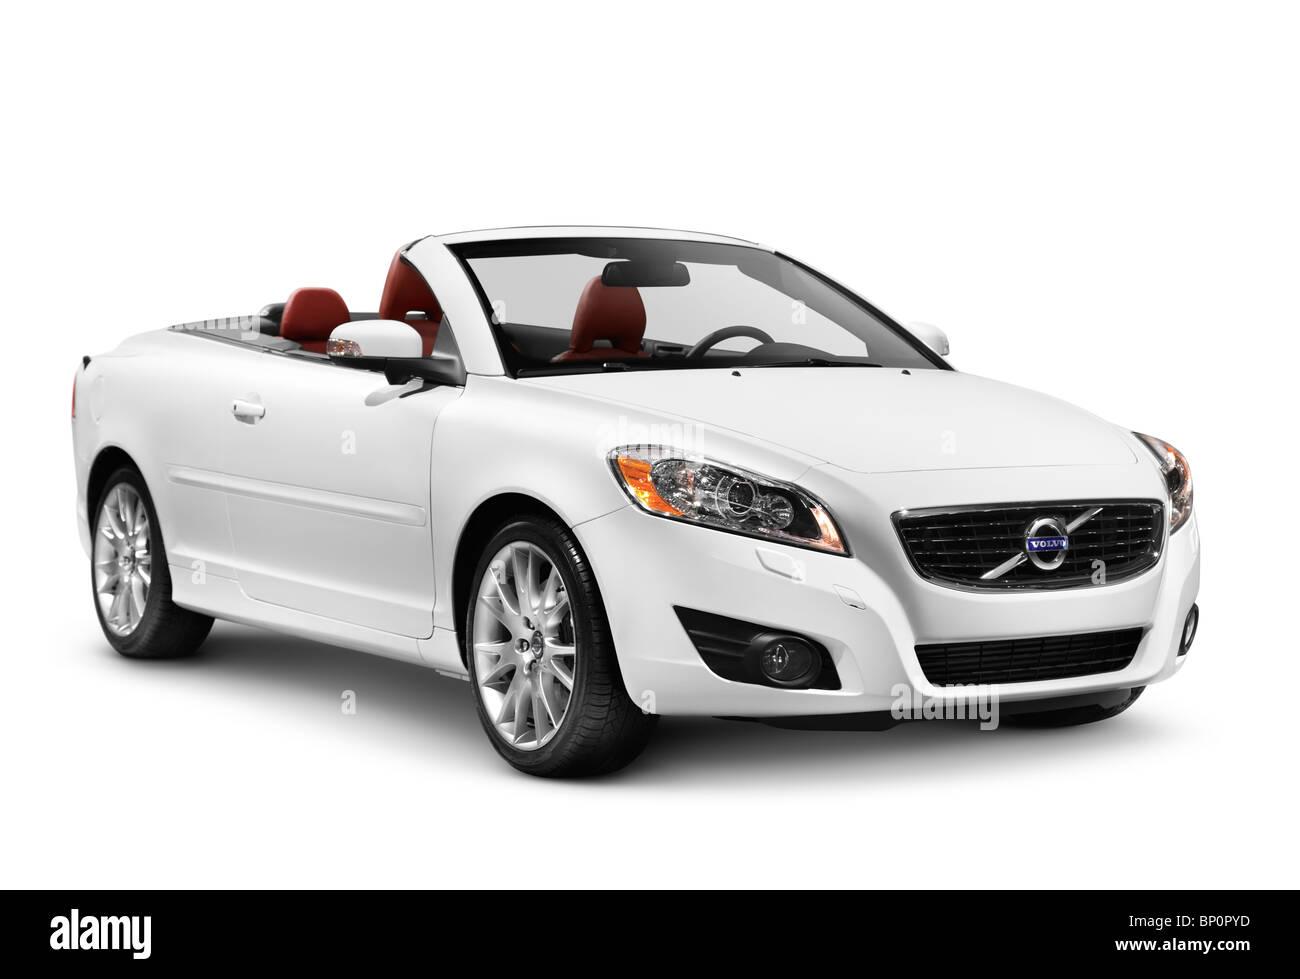 white 2011 volvo c70 coupe cabrio auto isoliert auf wei em. Black Bedroom Furniture Sets. Home Design Ideas